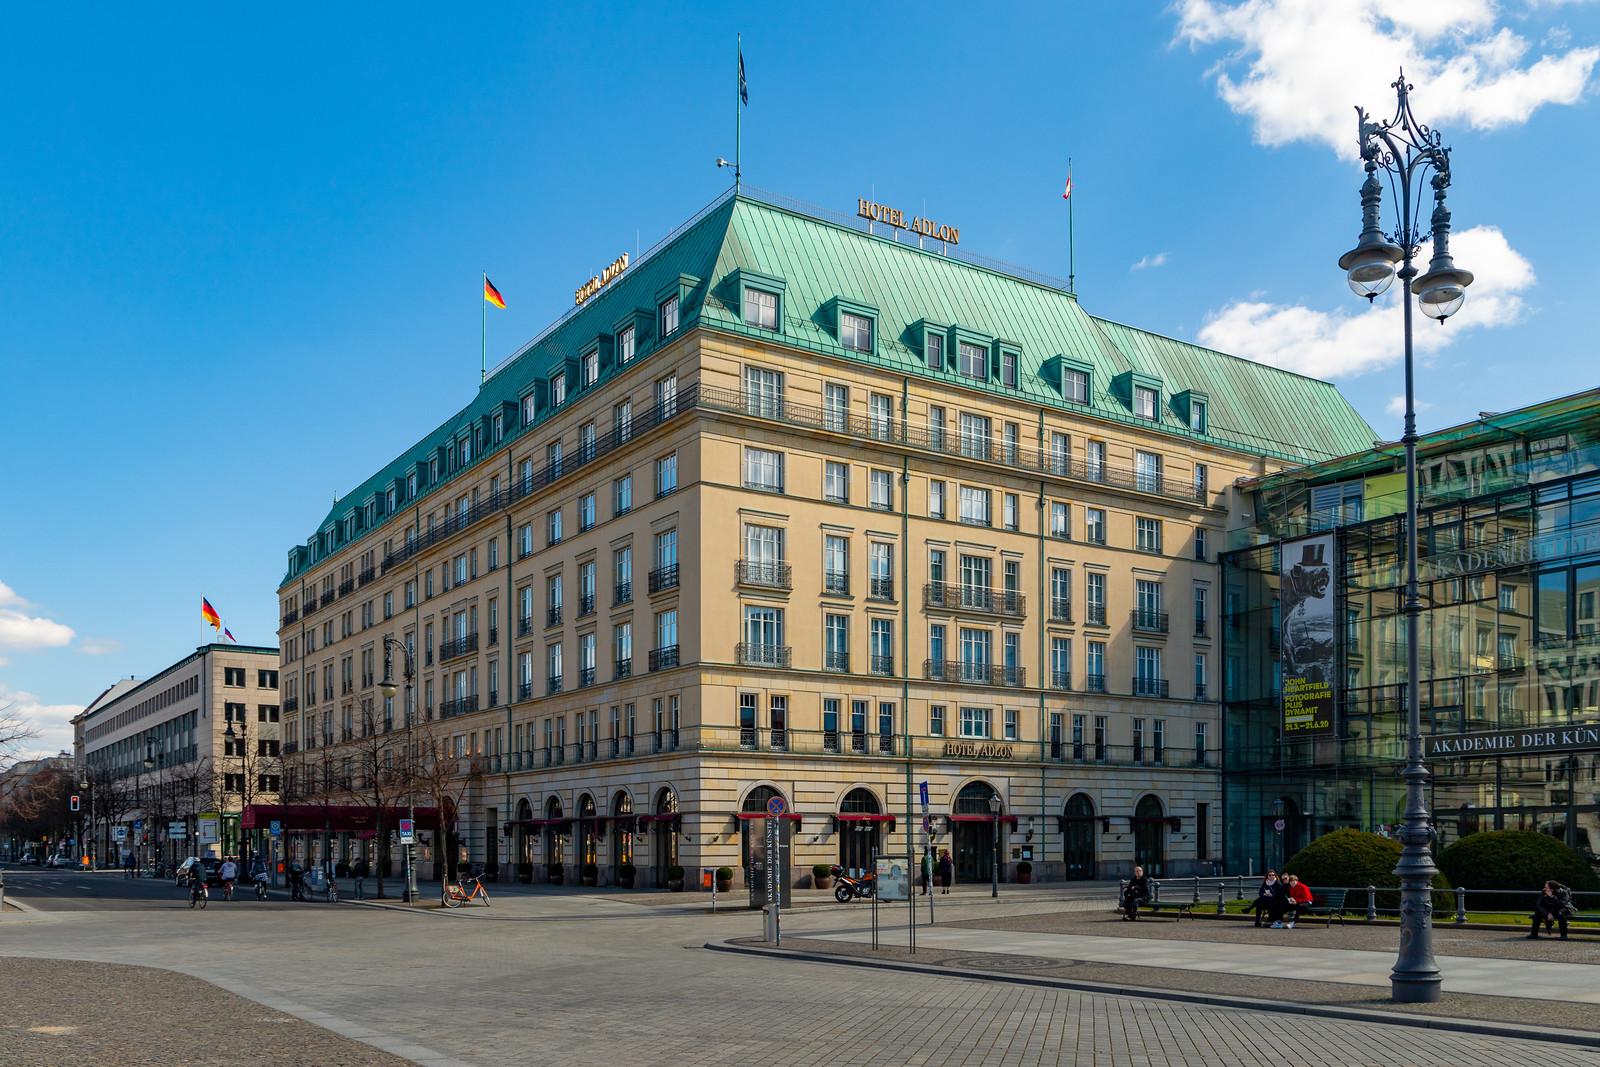 Das Hotel Adlon